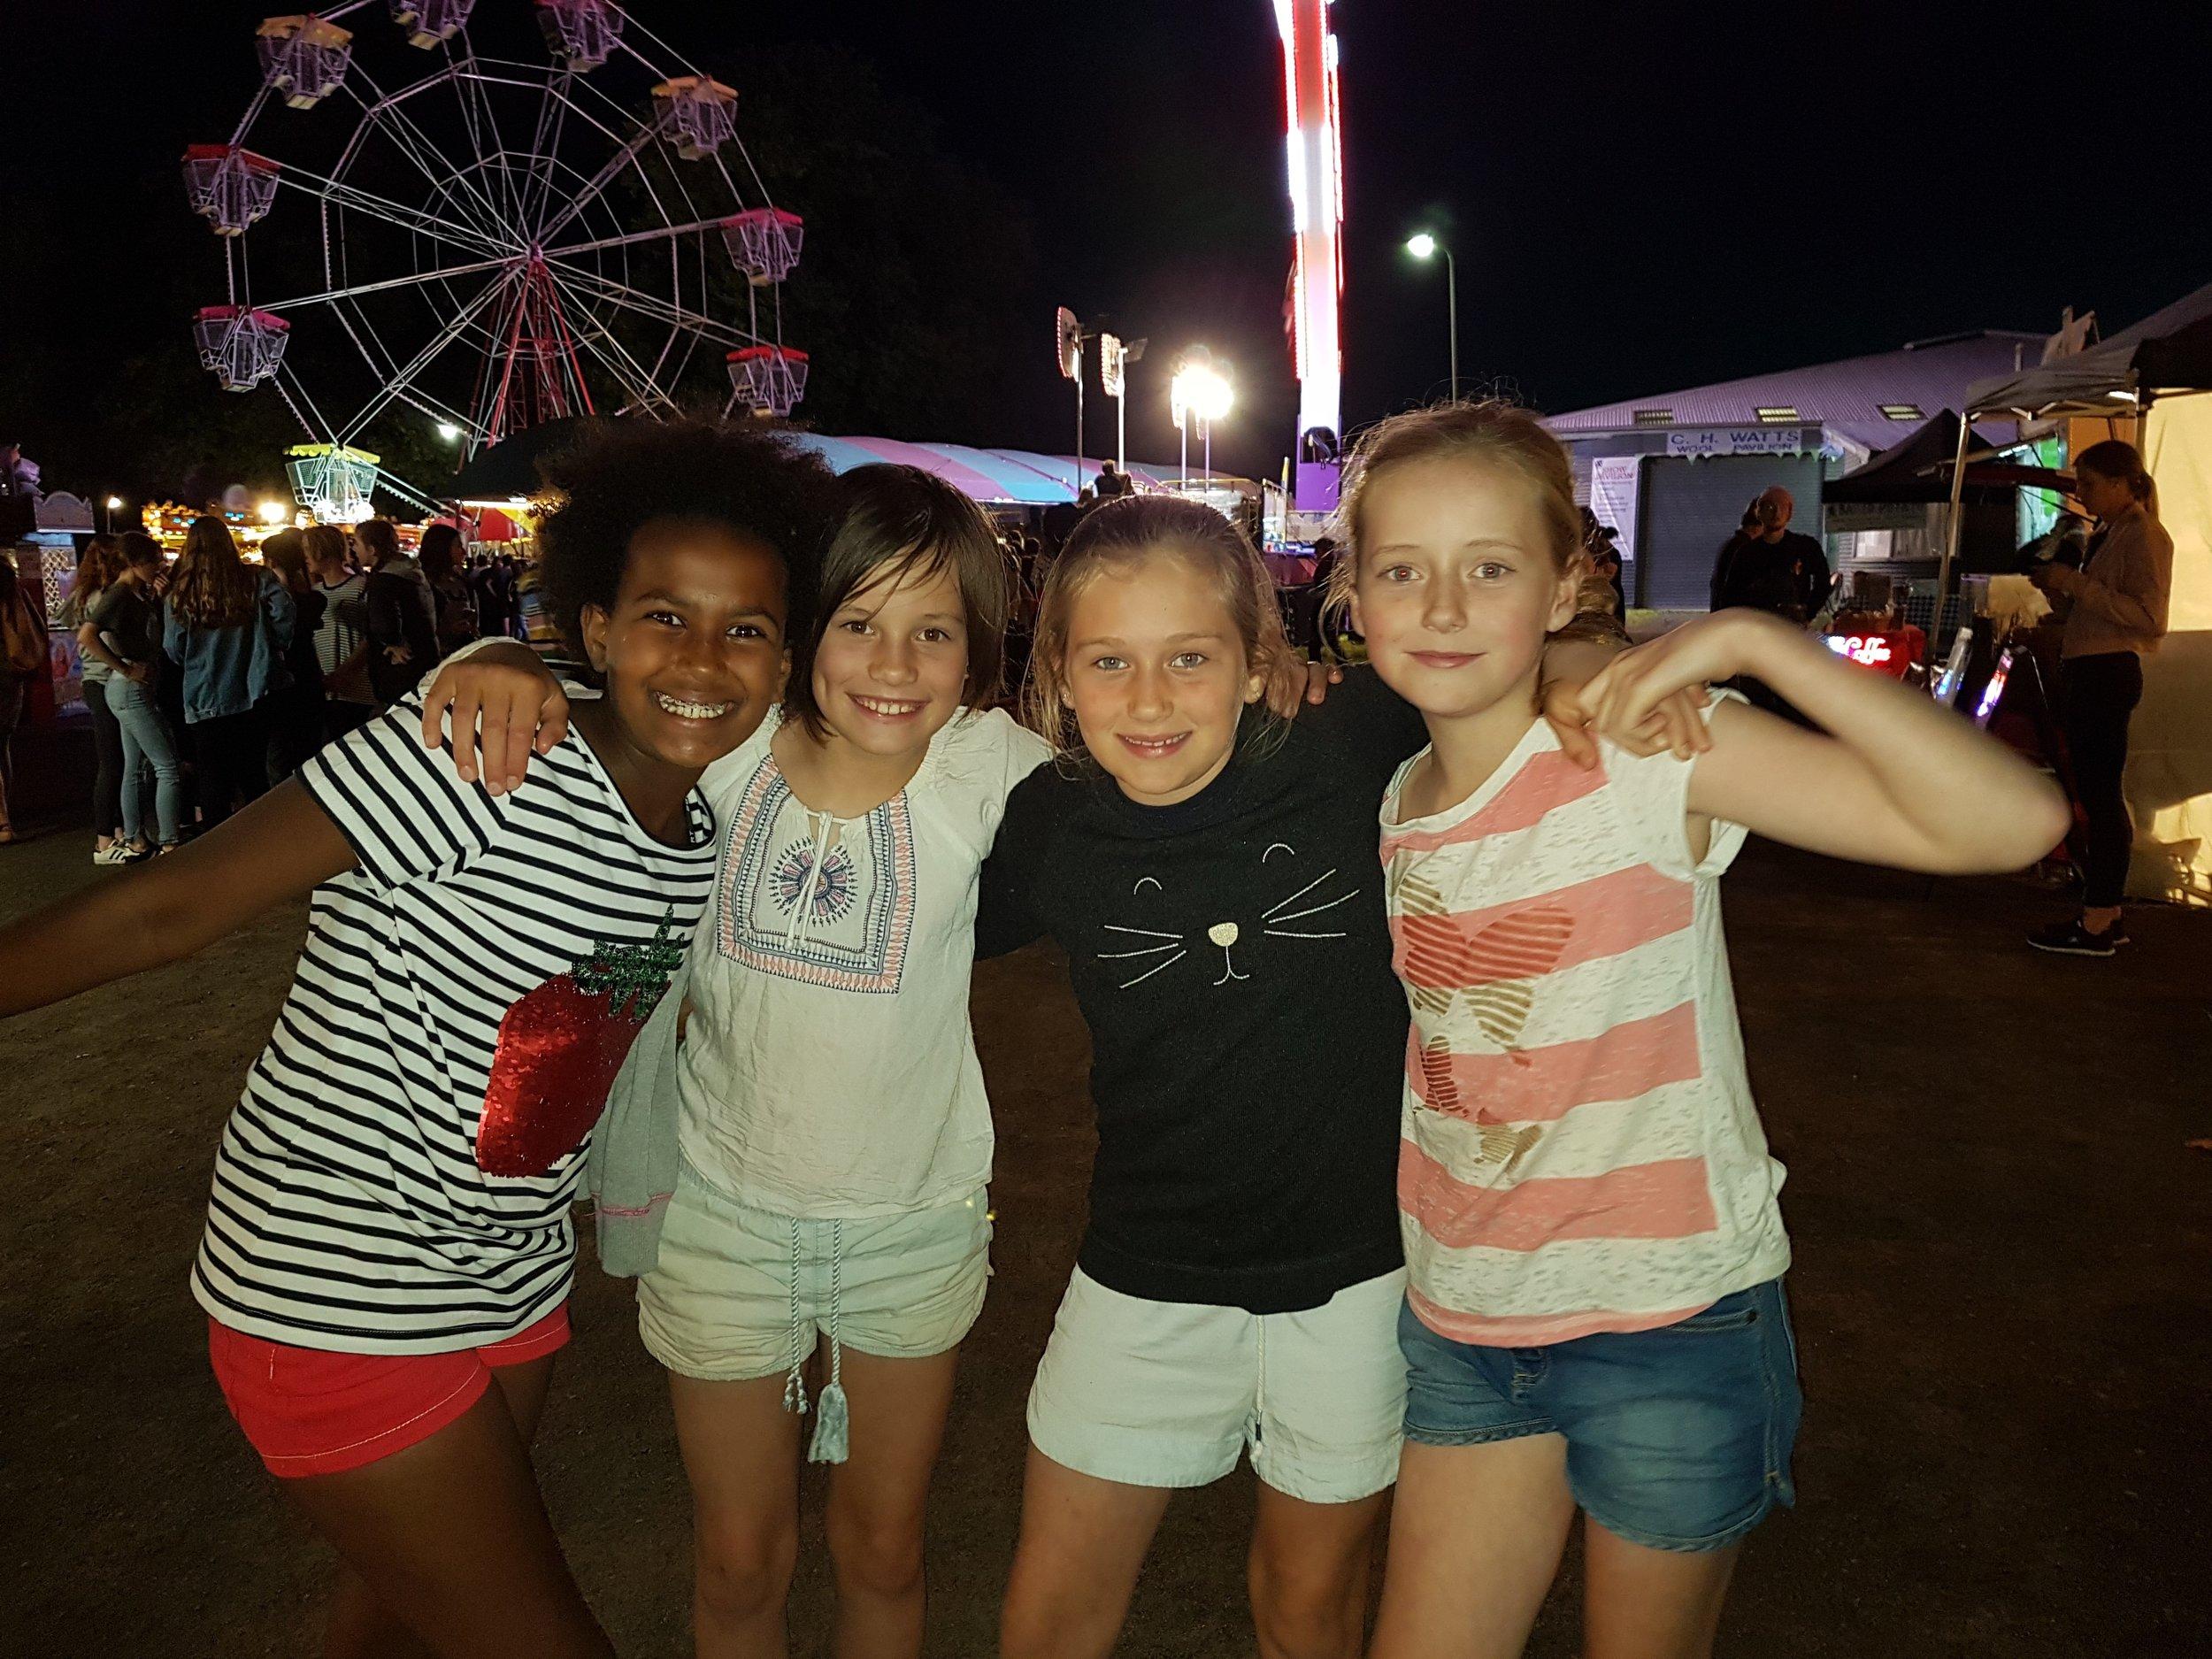 Abby, Evie, Matilda, Julia_9, 10, 10, 10_Kyneton.jpg